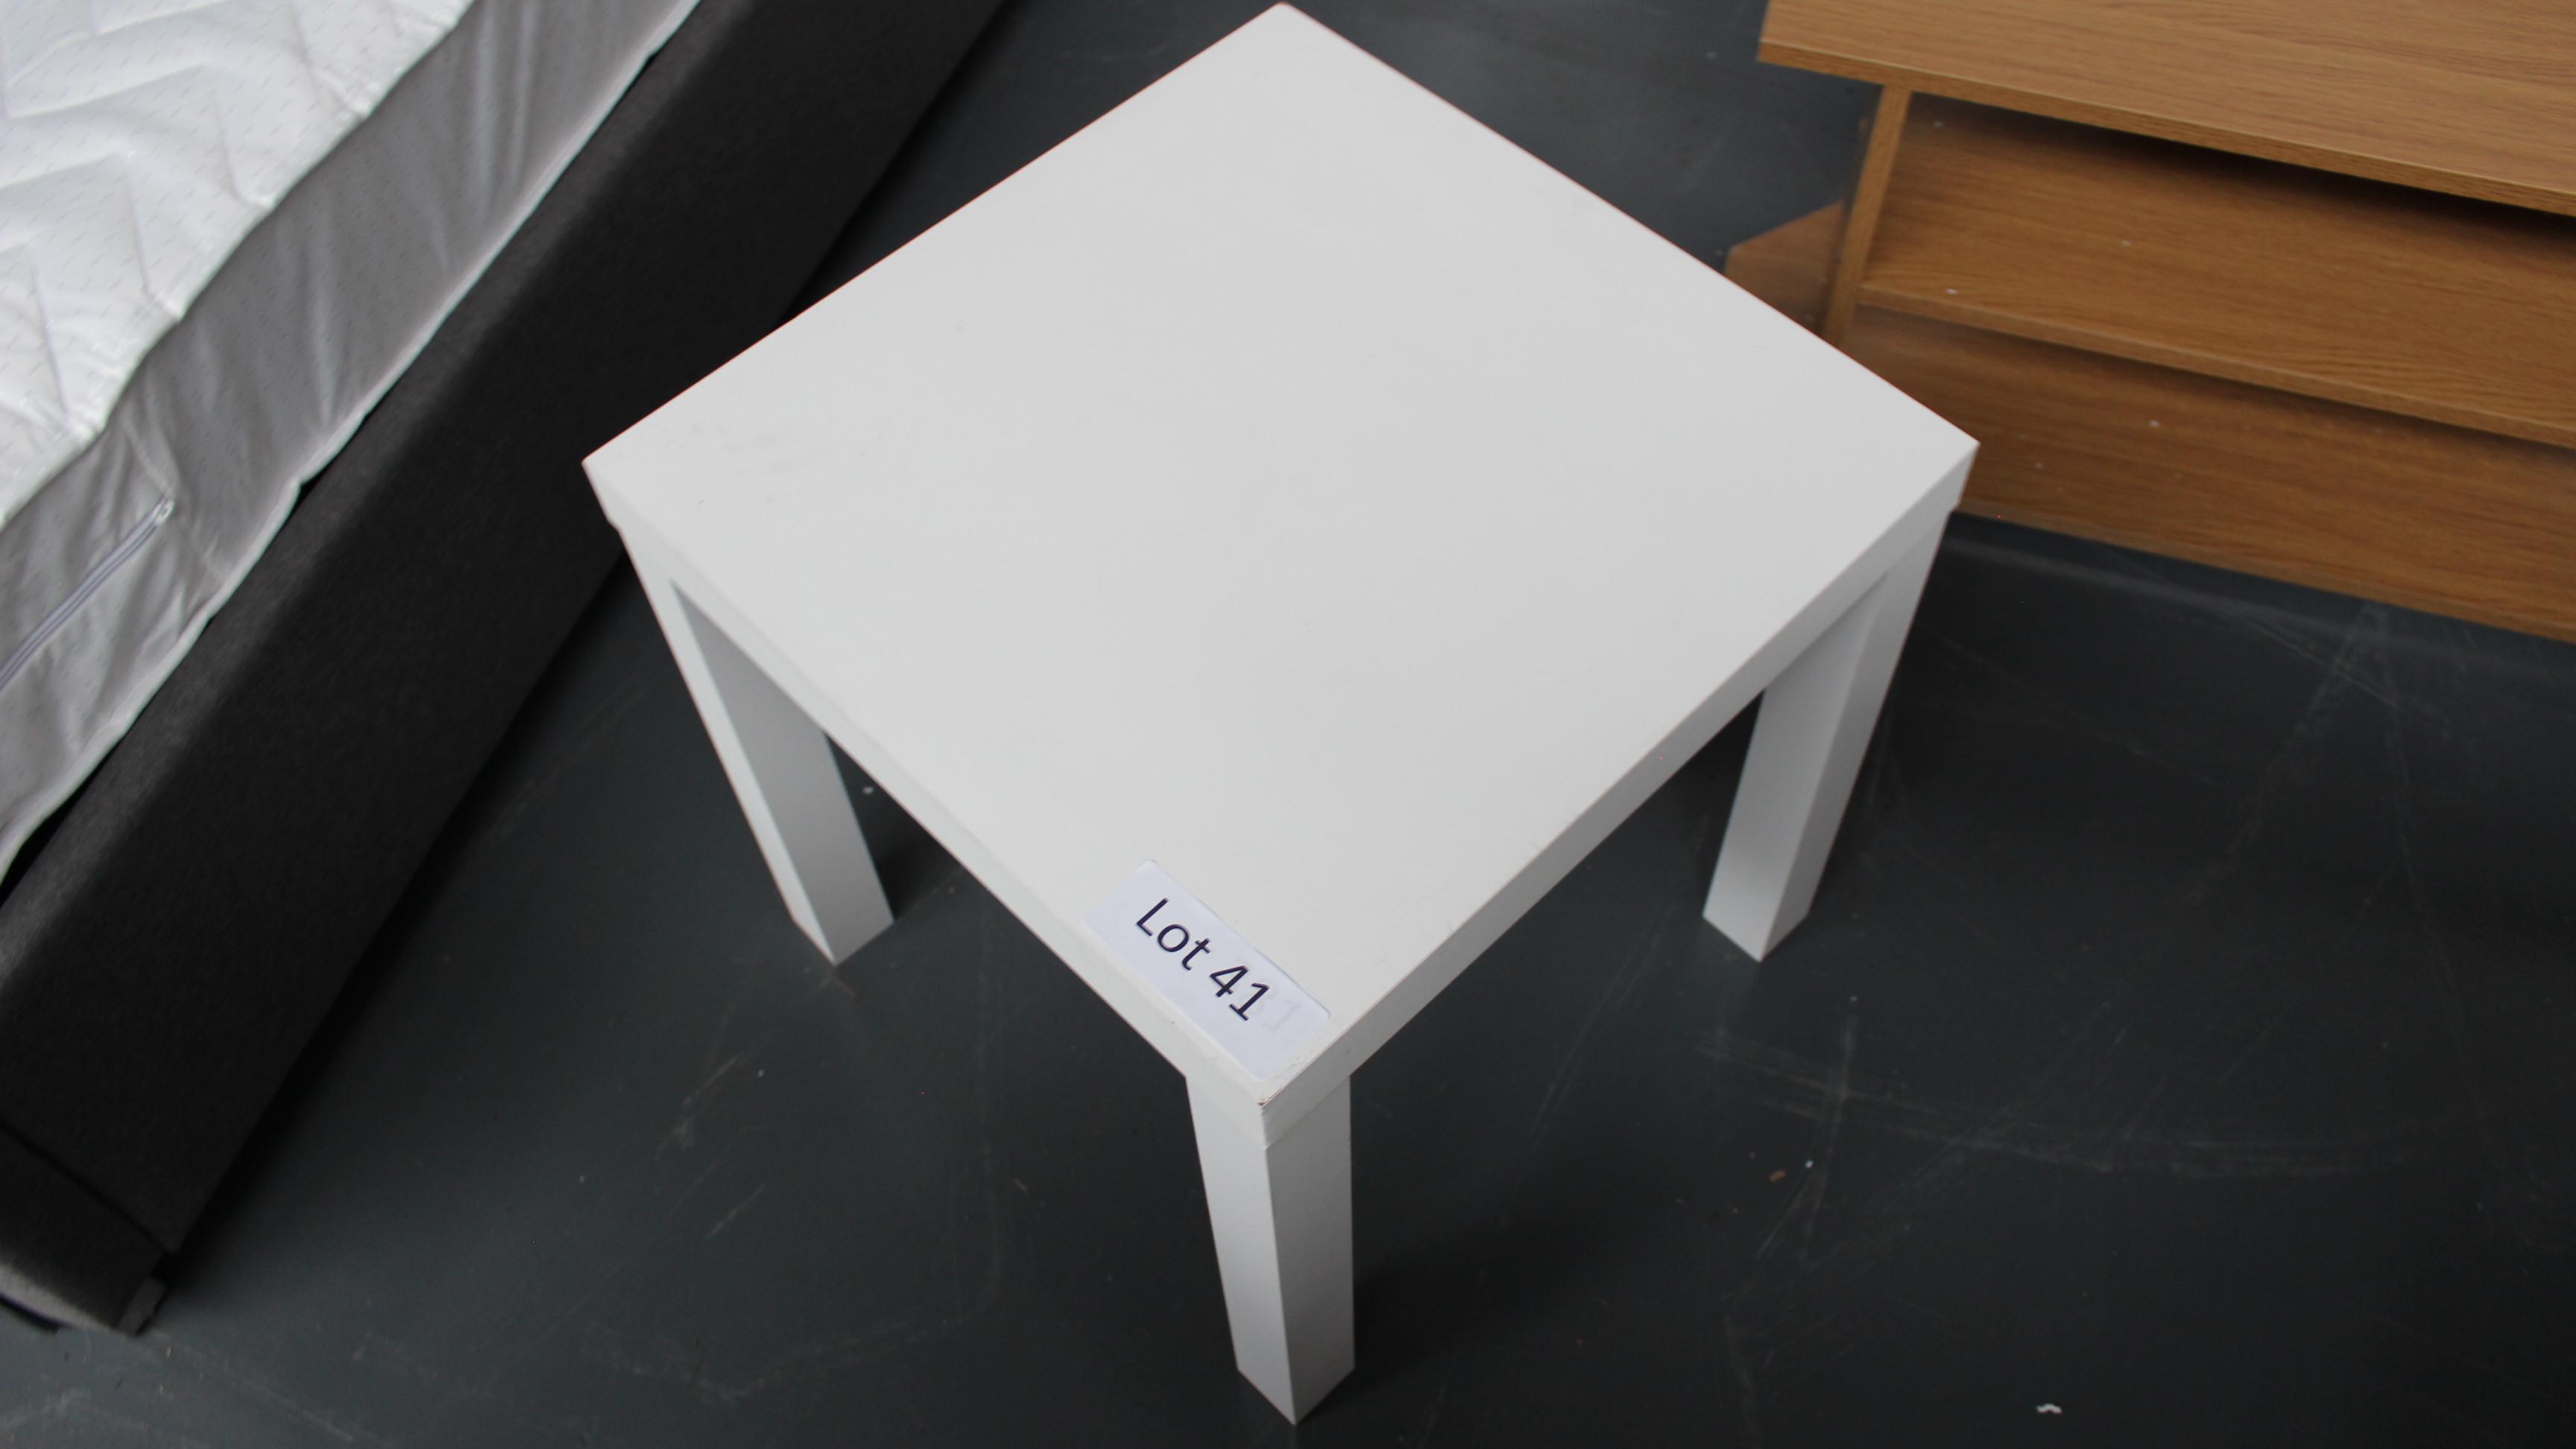 Lot 41 - Wooden Table. Customer Returns